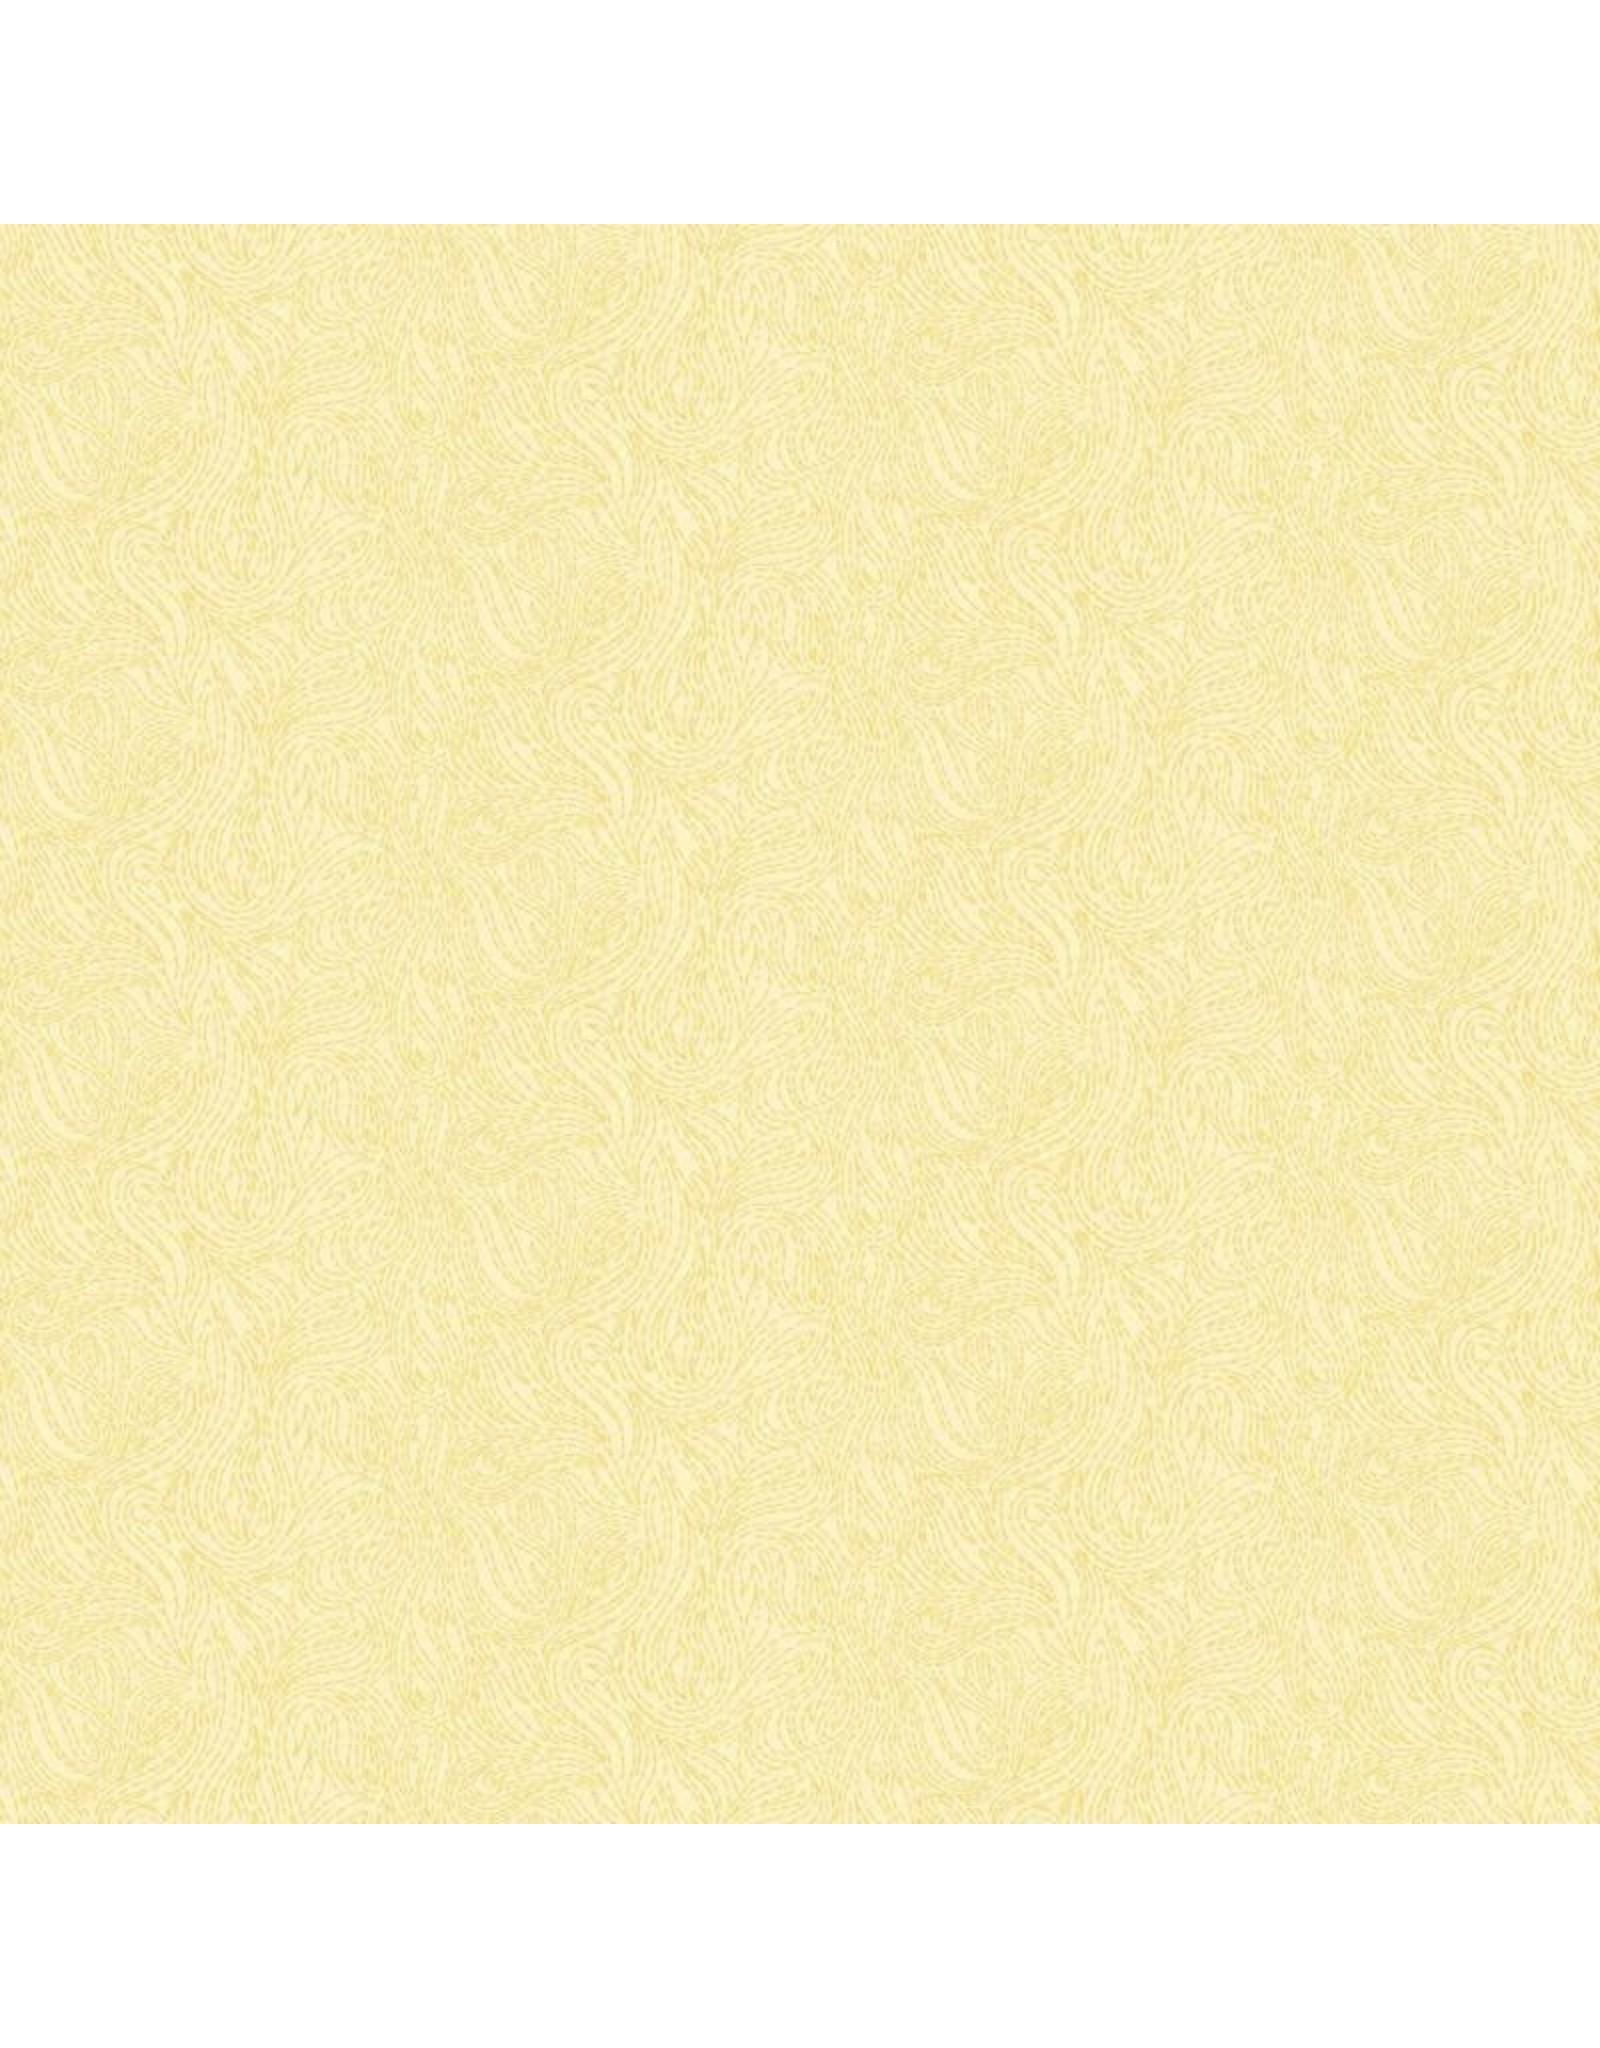 Figo Elements, Fire in Butter, Fabric Half-Yards 92009-50